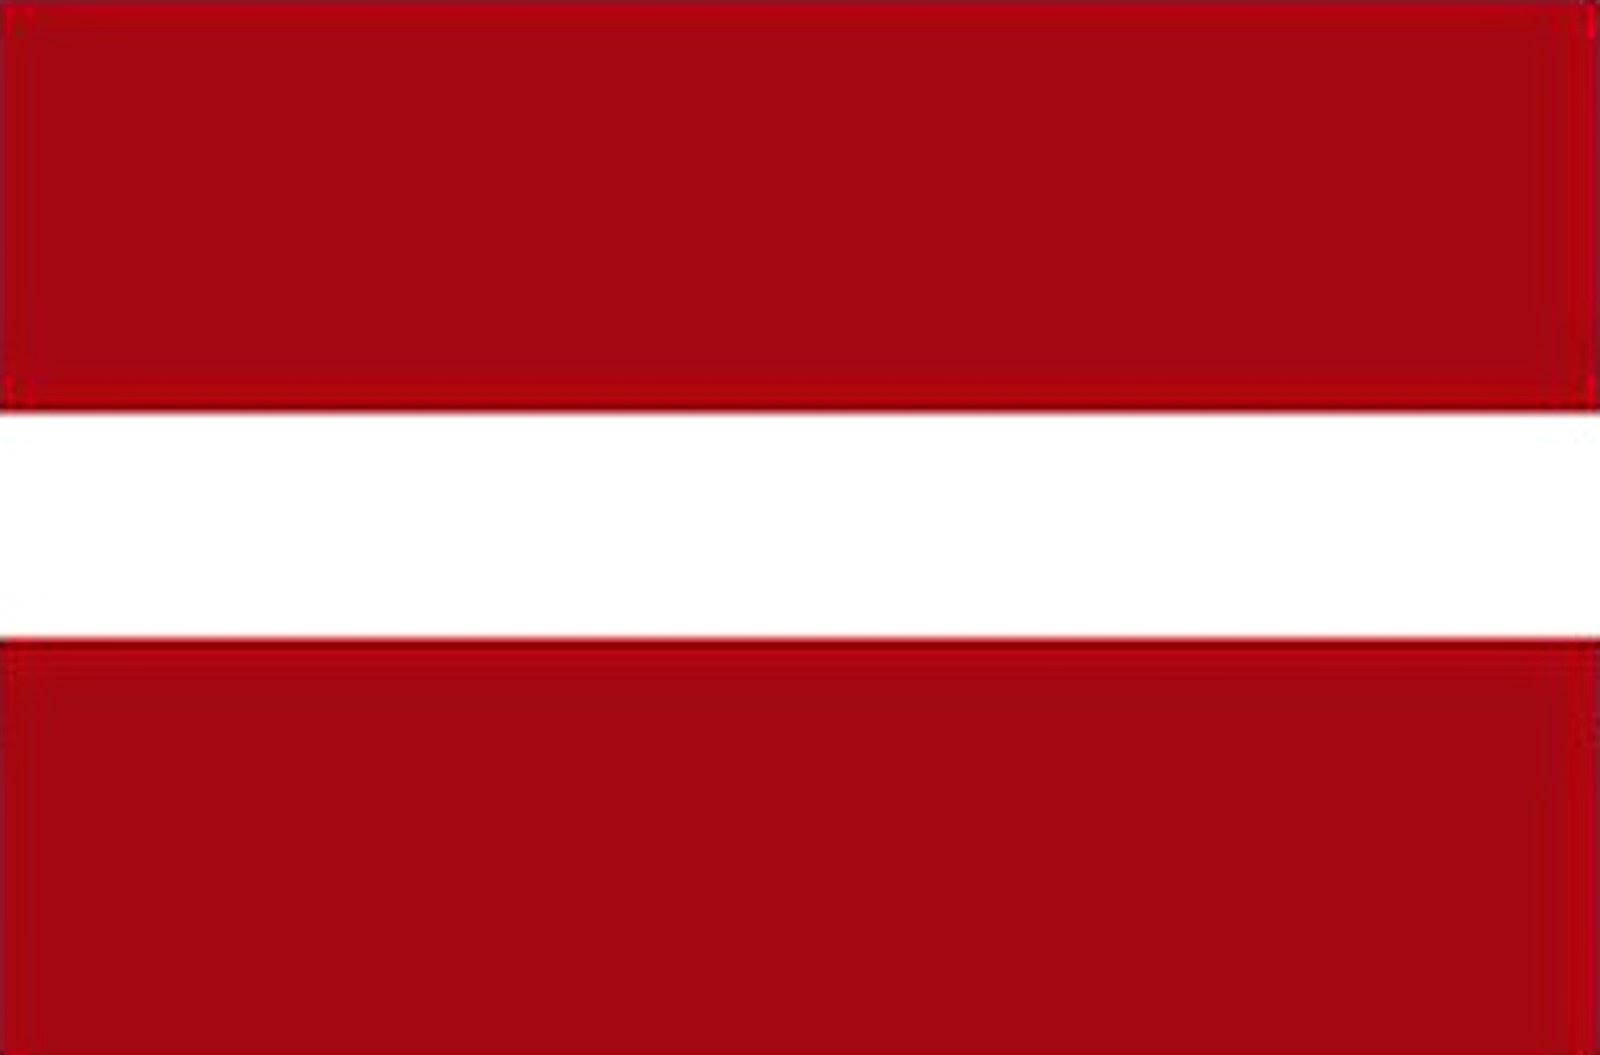 http://carbrandsincurrentproduction.blogspot.com.es/search/label/Latvia